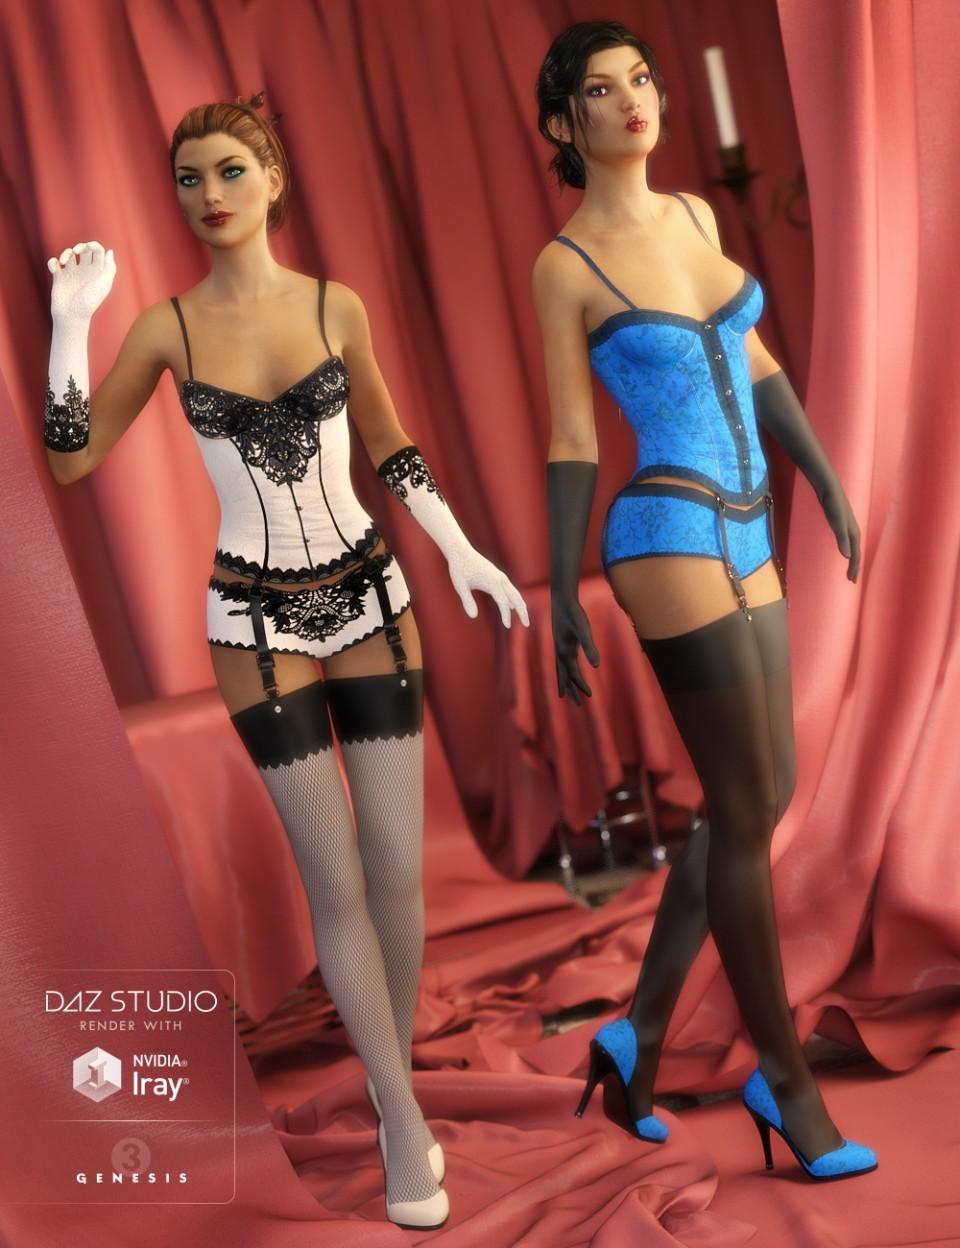 Corset Lingerie Textures_DAZ3D下载站